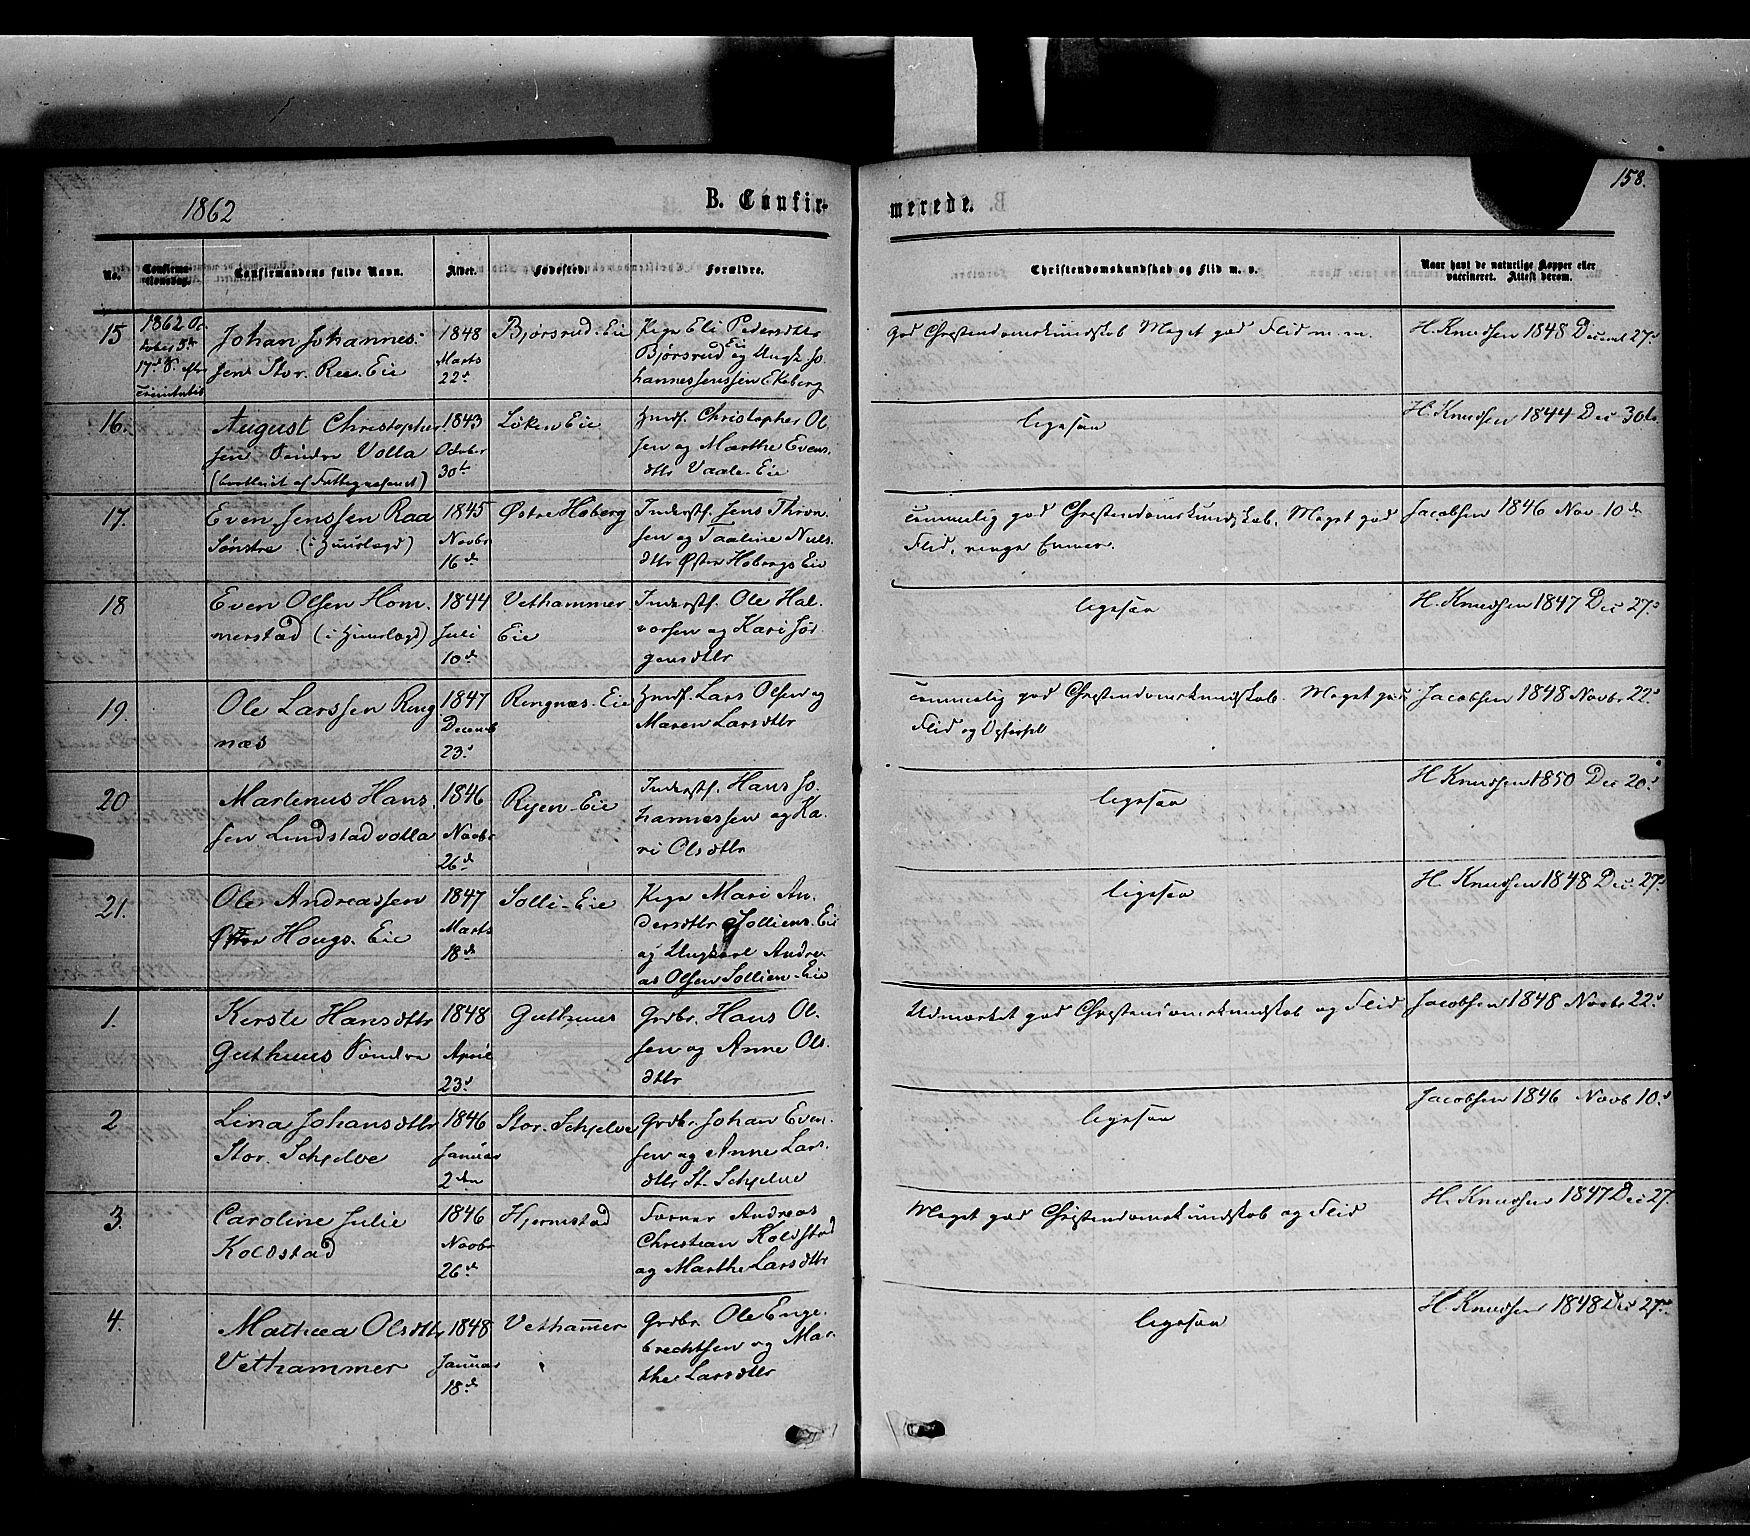 SAH, Stange prestekontor, K/L0013: Ministerialbok nr. 13, 1862-1879, s. 158